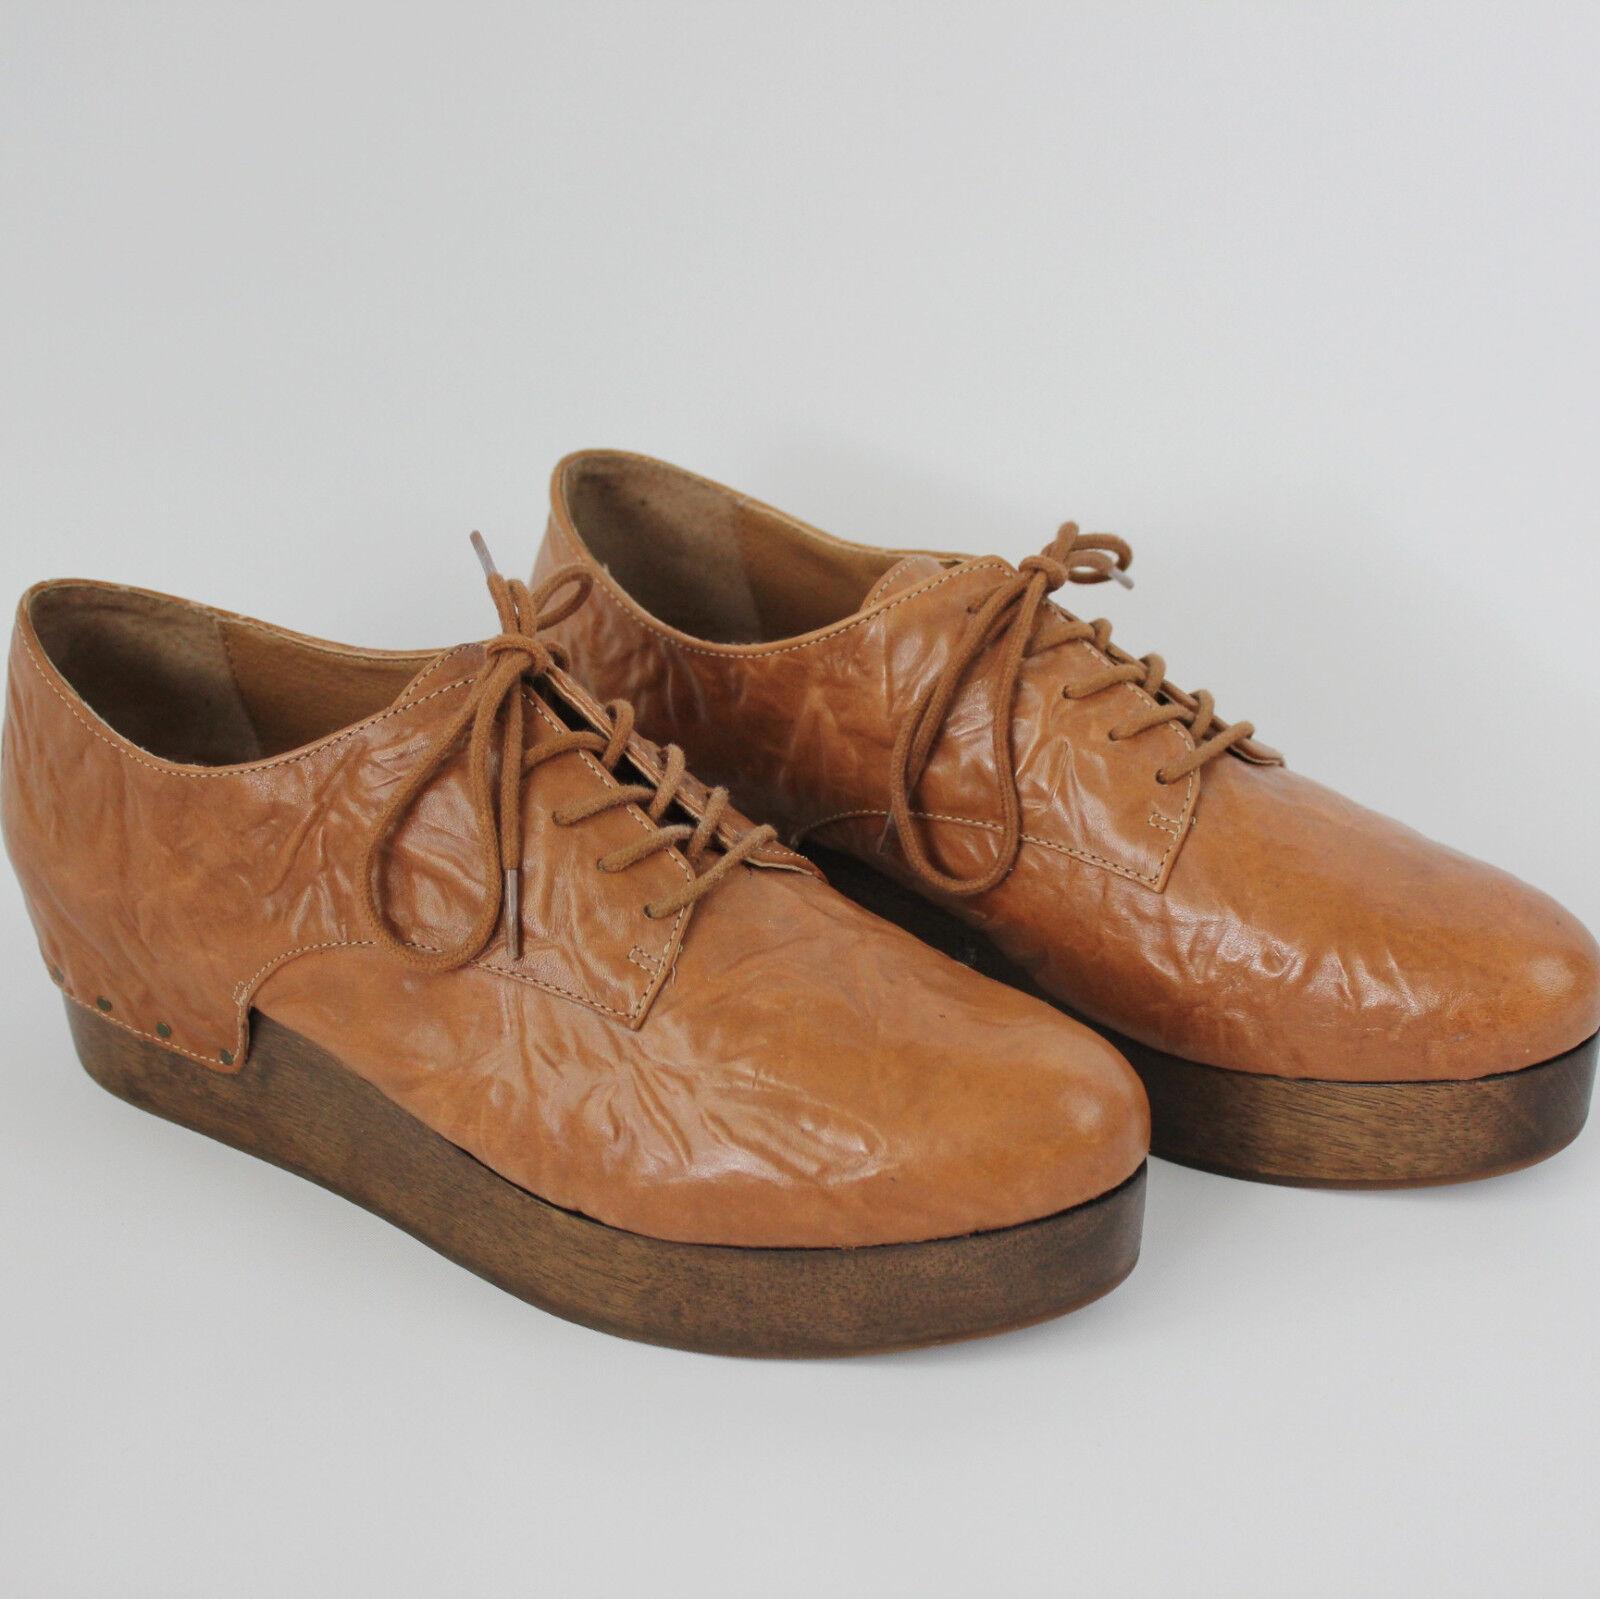 vendita calda online Anthropologie Kelsi Dagger Brooklyn Donna  Jamie Platform Oxford Oxford Oxford scarpe Dimensione 9  al prezzo più basso